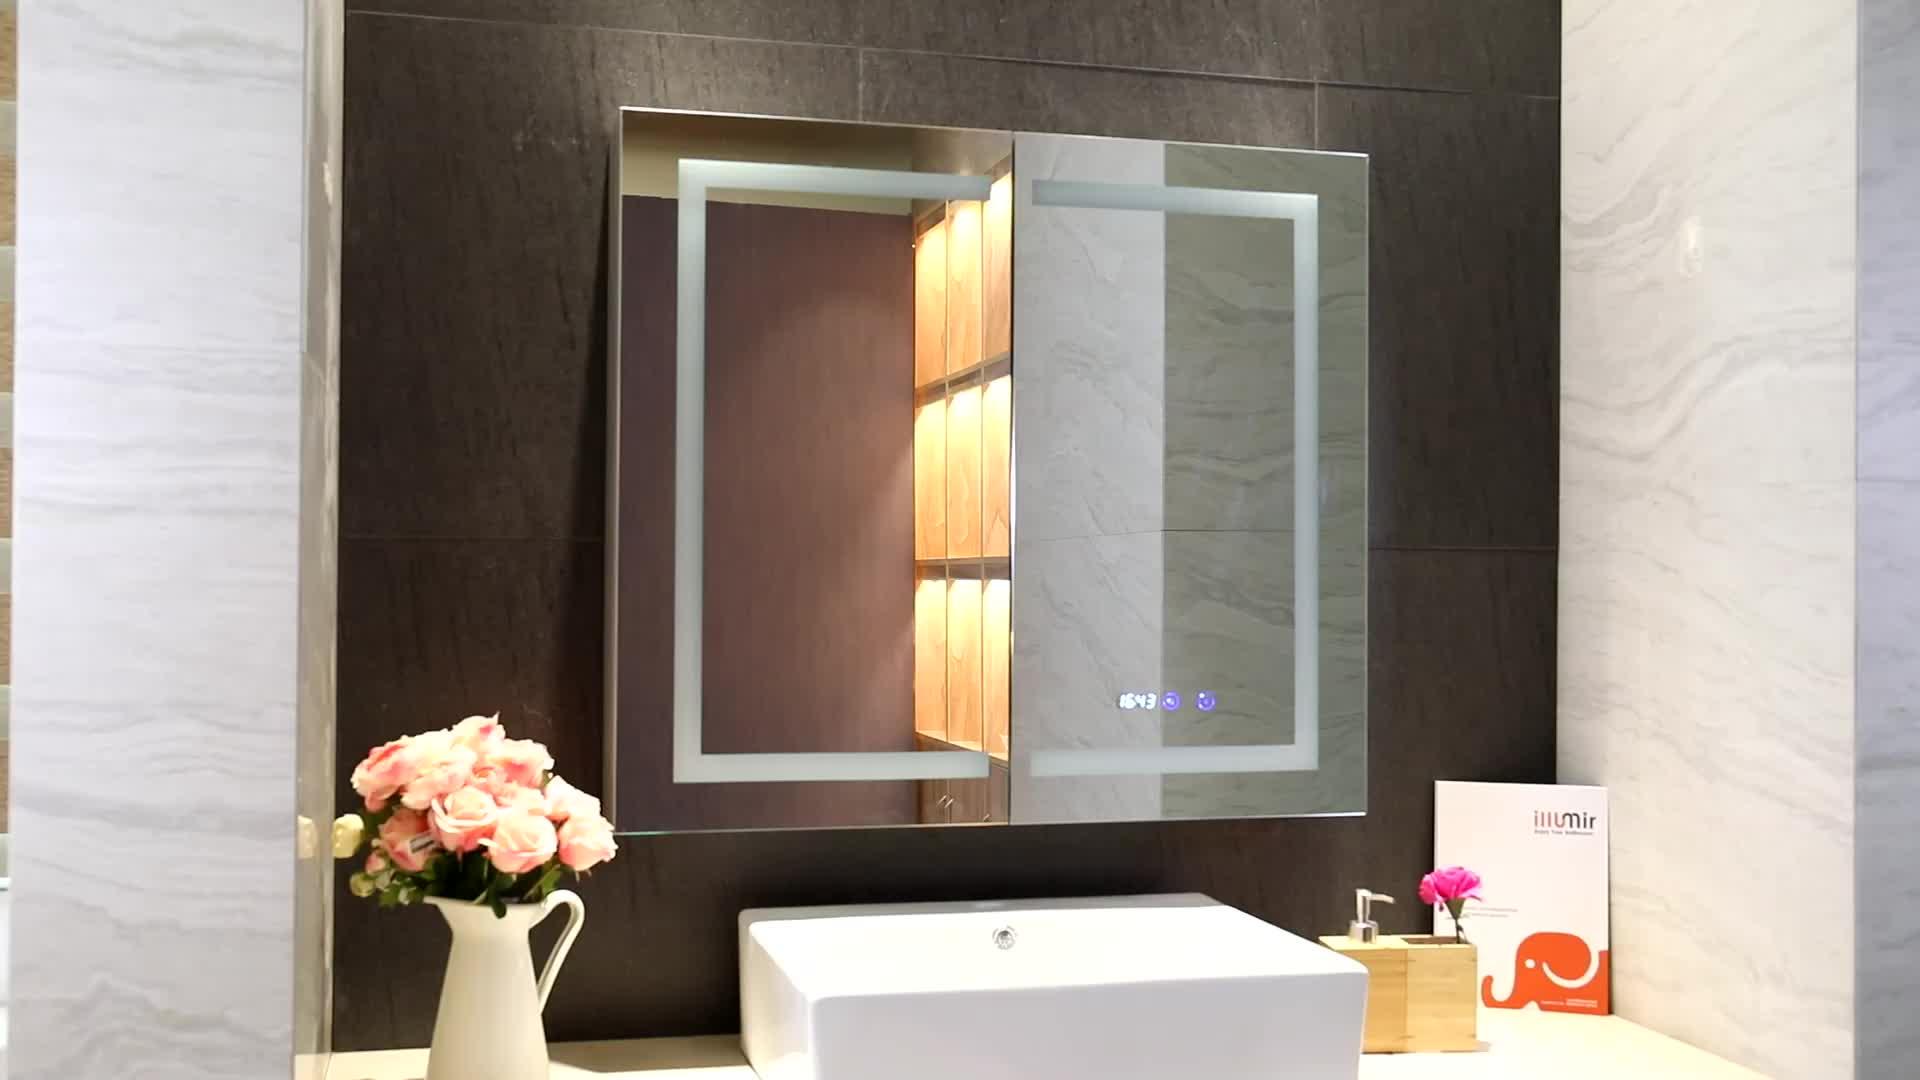 Foshan ETERNE Modern Wall Mounted Illuminated Lighted LED Mirrored Medicine Cabinet in Bathroom